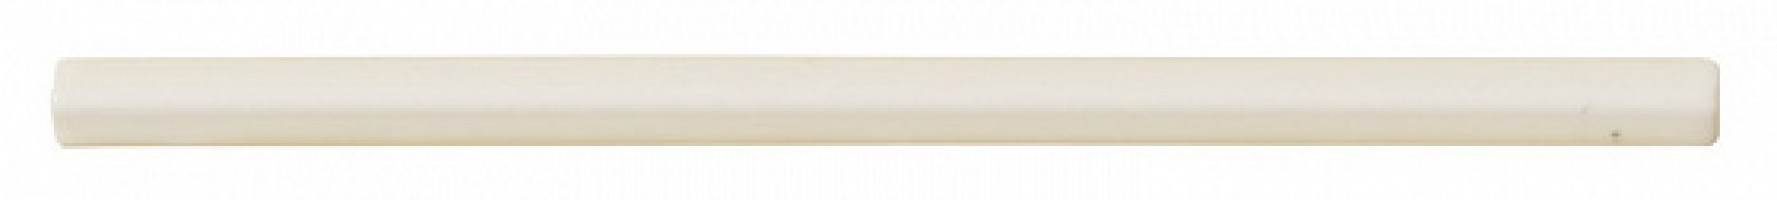 Бордюр Studio ADST5234 Bullnose Trim Almond 0.75x19.8 Adex